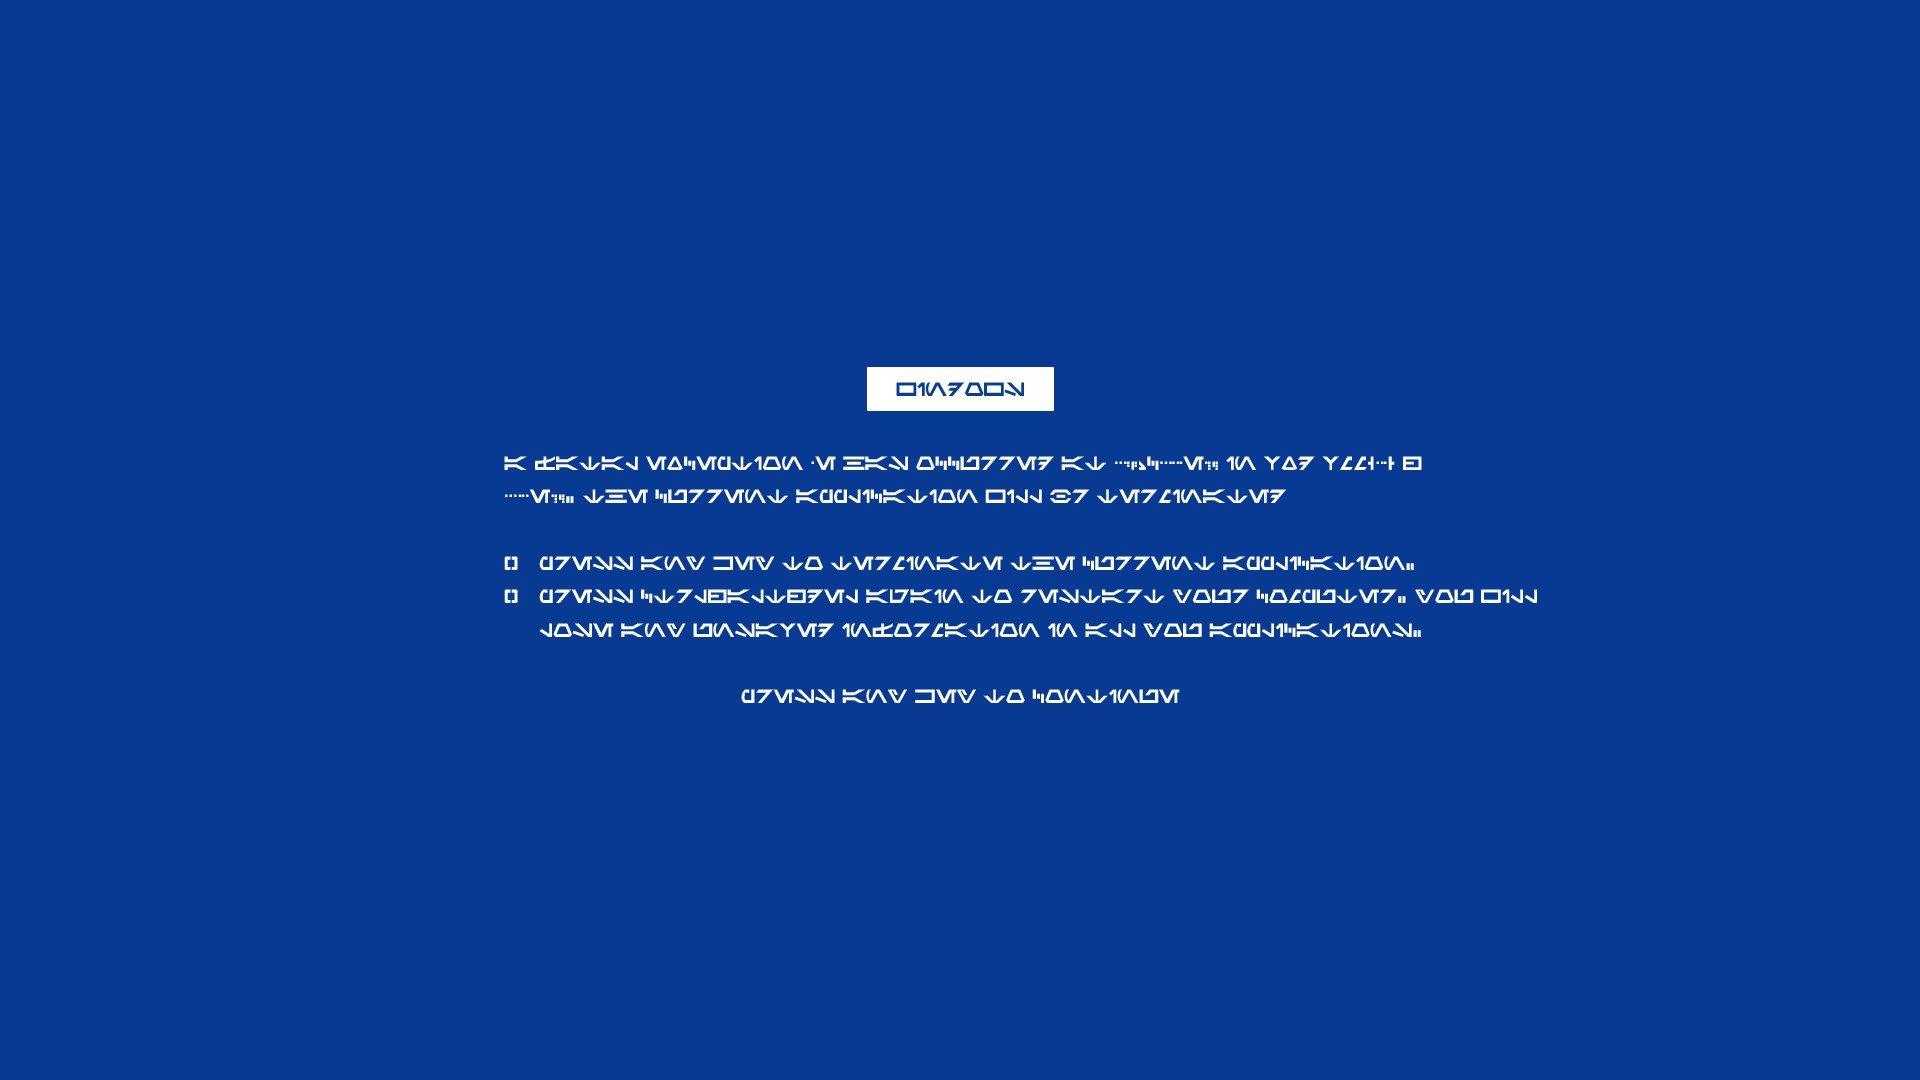 44 Microsoft Windows 10 Starwars Wallpaper On Wallpapersafari